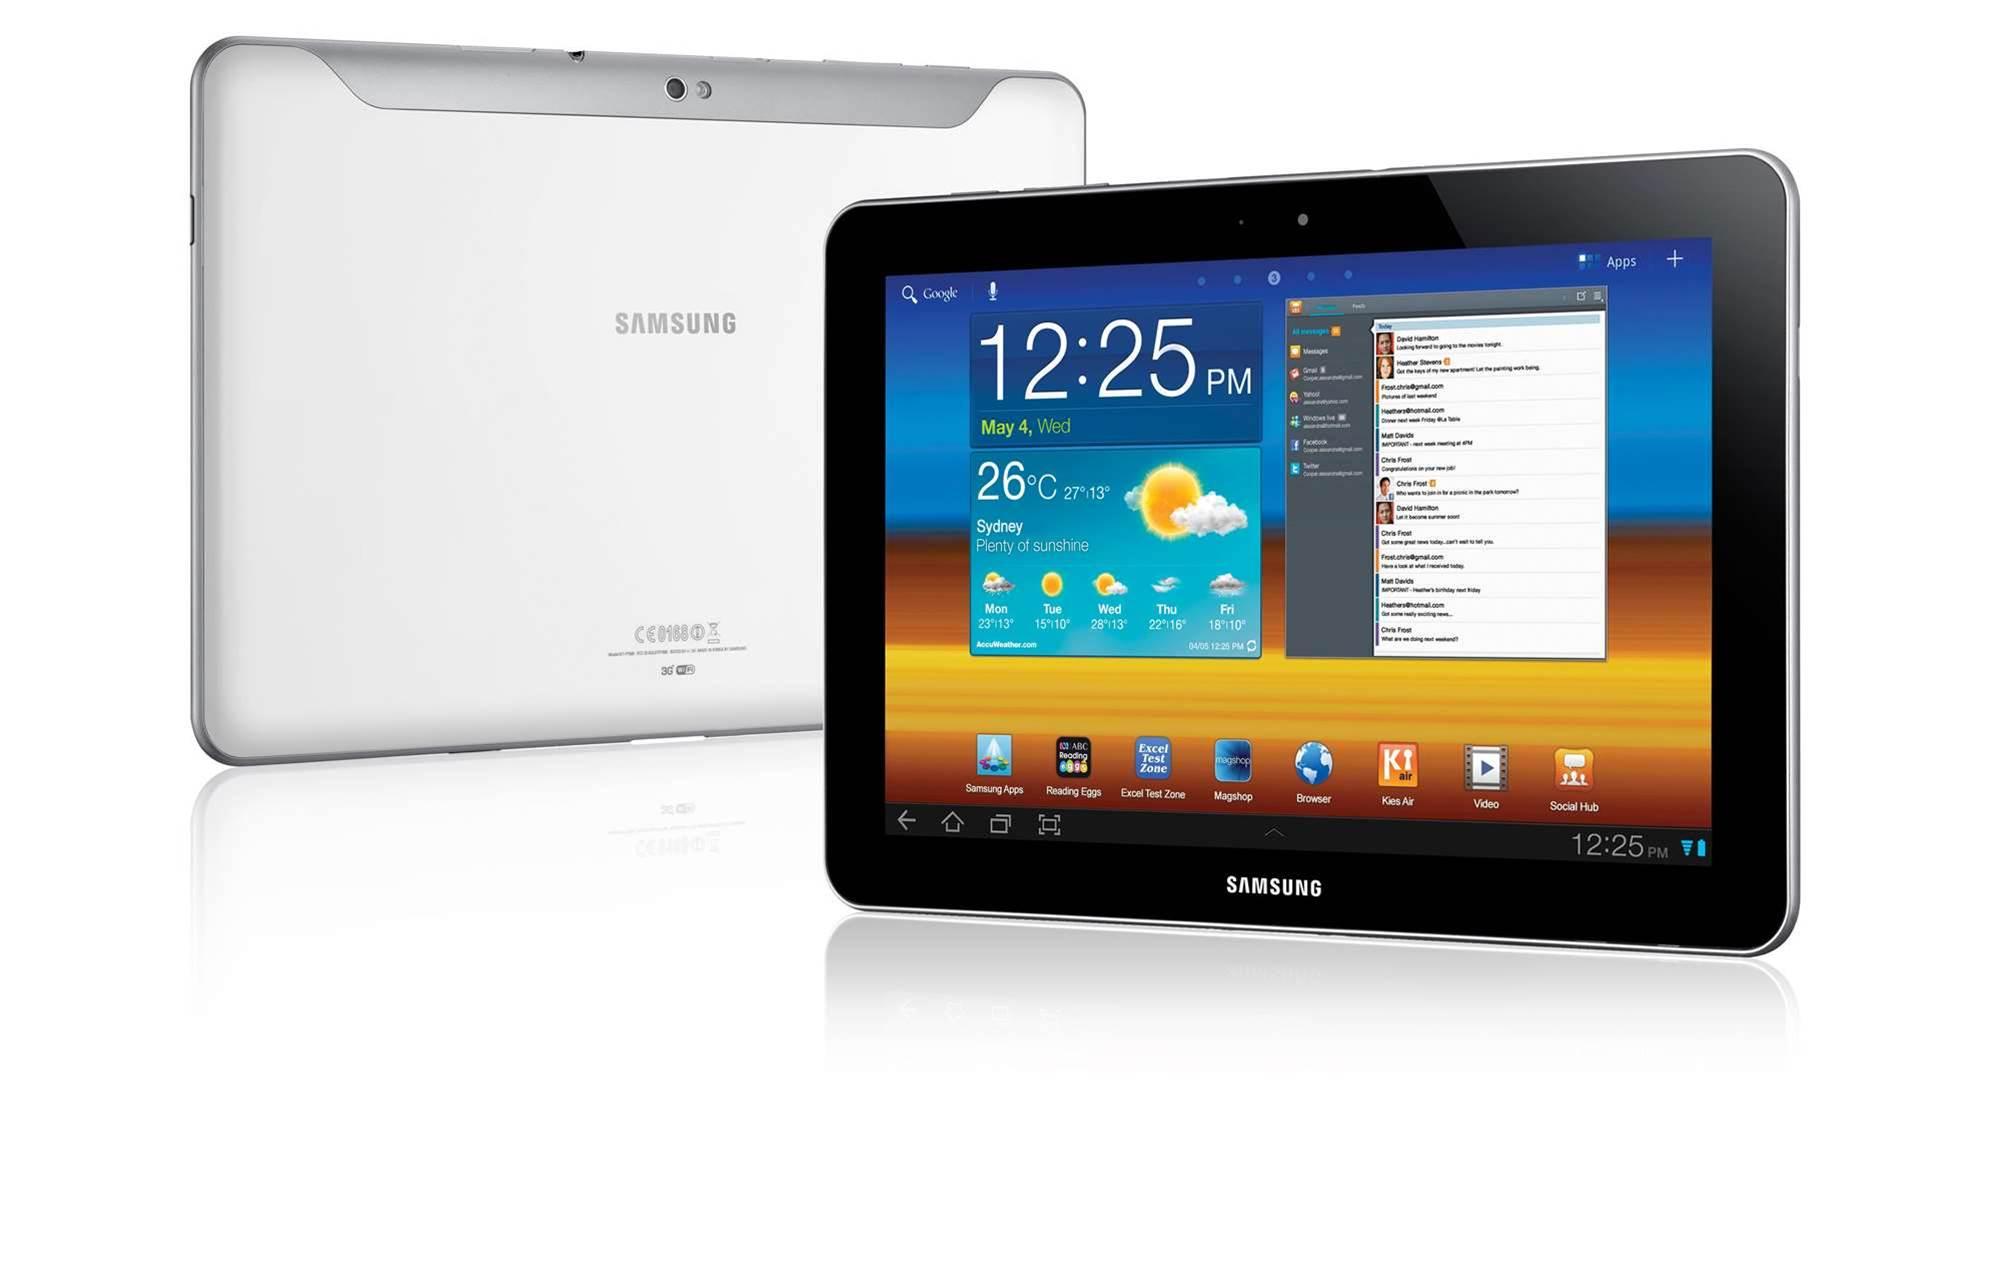 Vodafone, Optus to stock Samsung Galaxy Tab 10.1